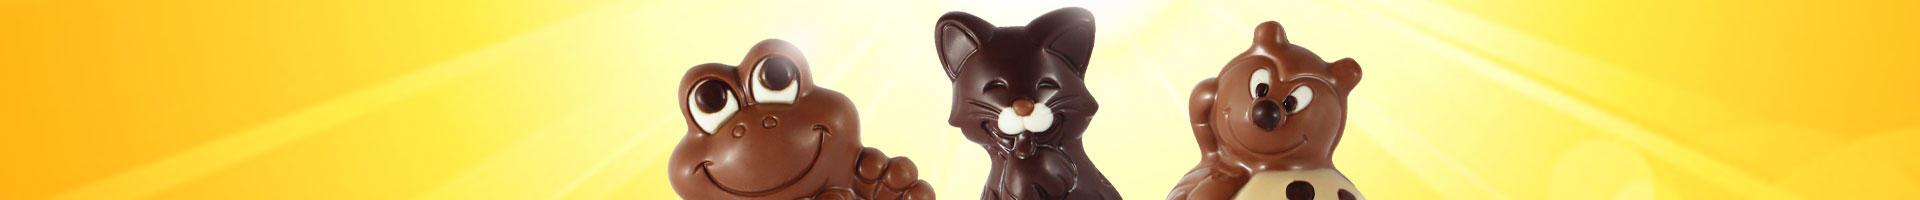 Chocolat & chaleur